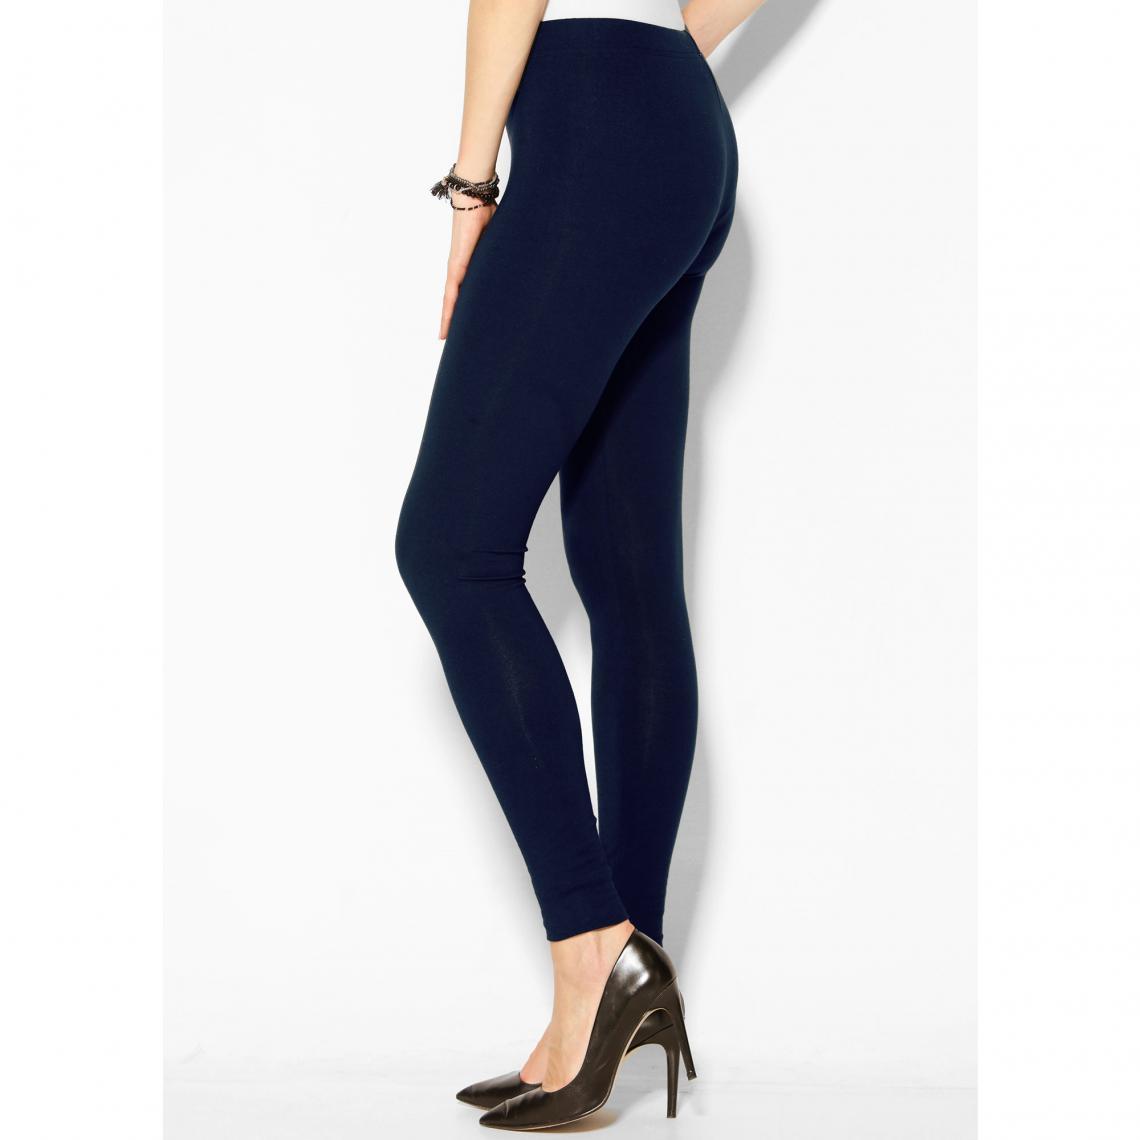 Legging : Comment acheter son legging minceur ?